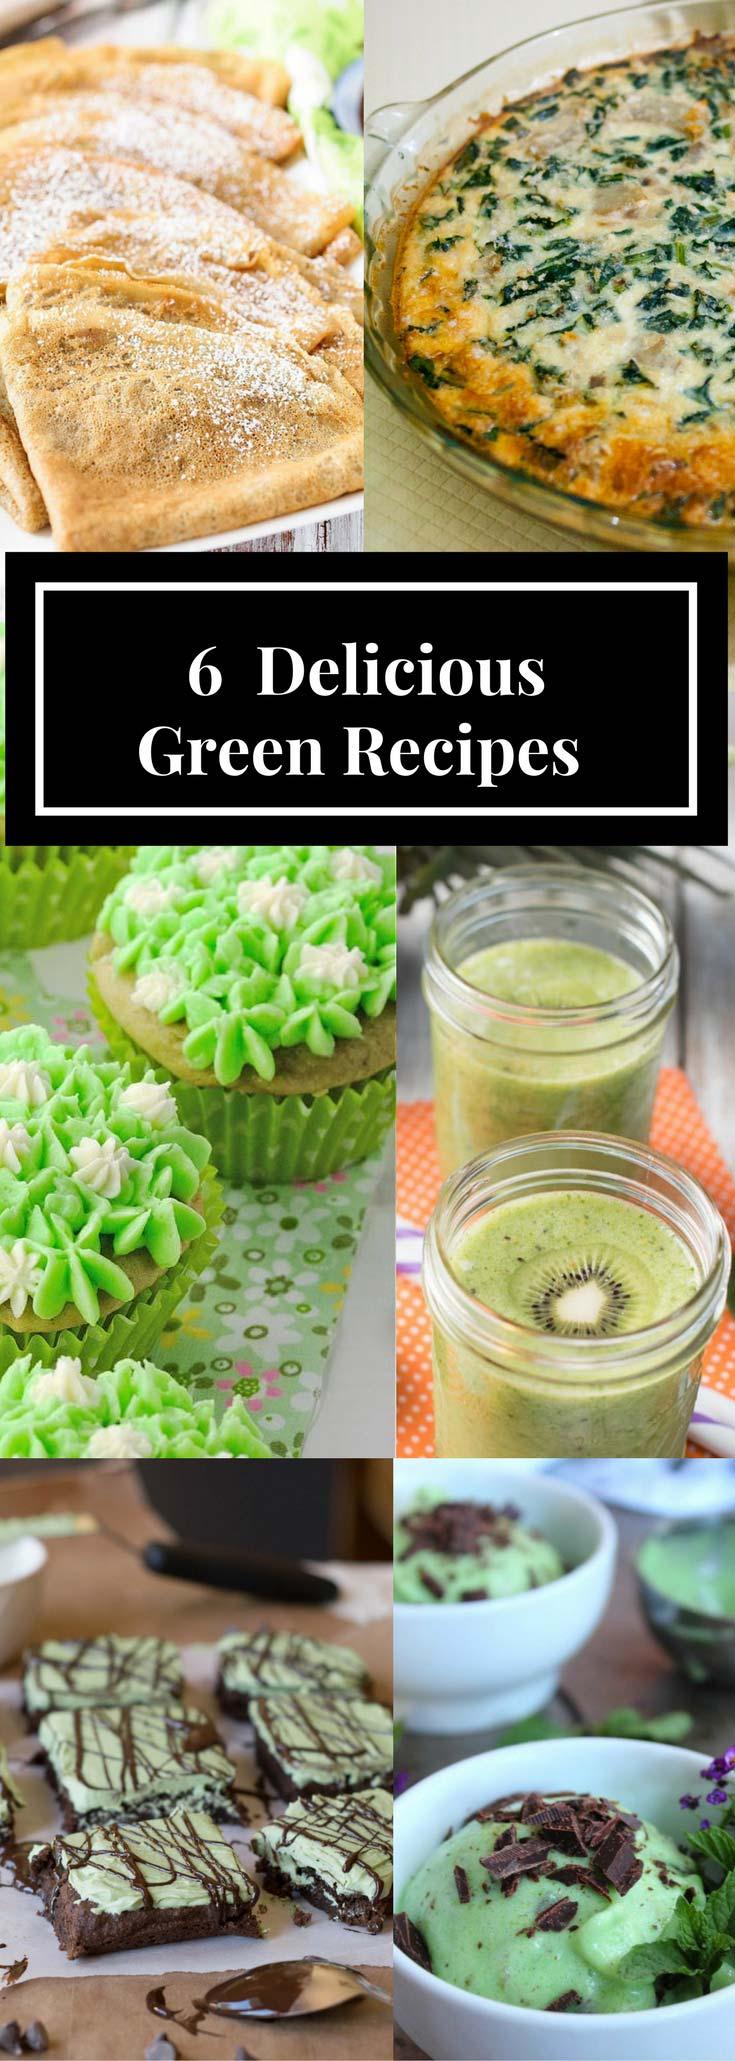 6 Delicious Green Recipes